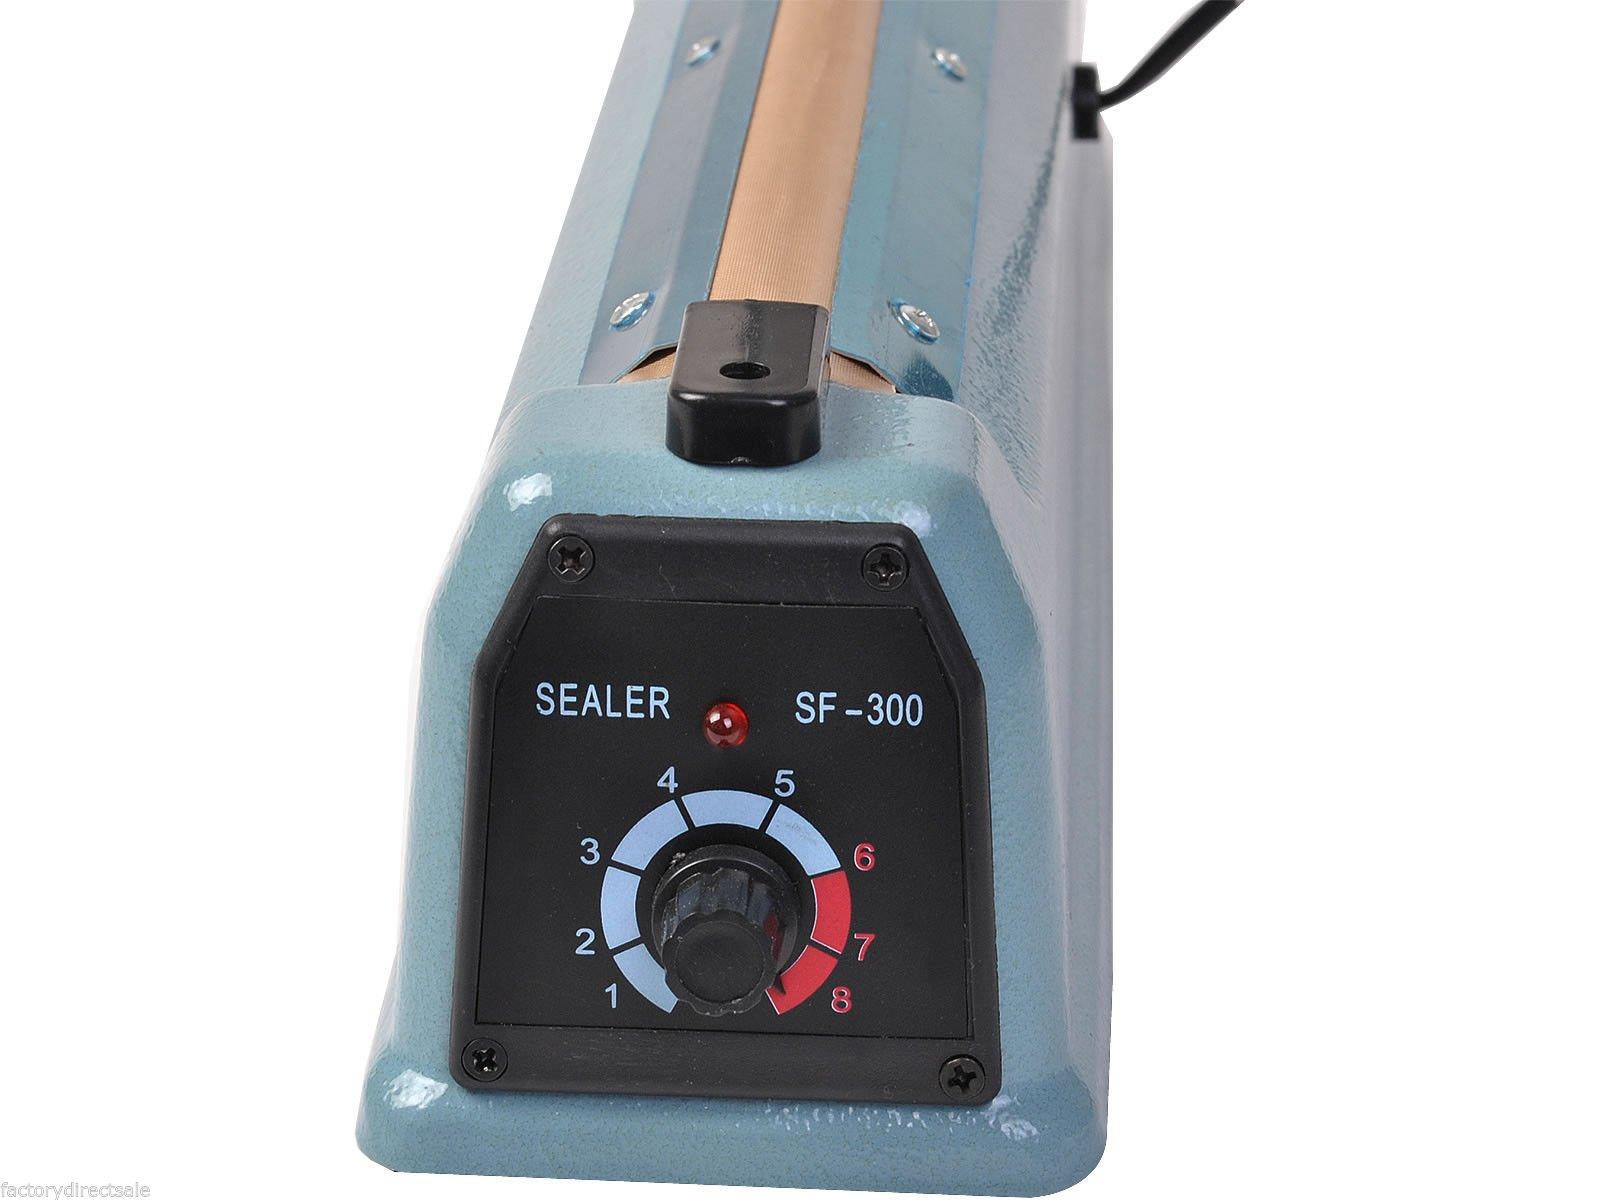 Super buy 12'' Heat Sealing Hand Impulse Sealer Machine Poly Free Element Grip& Teflon by Goplus (Image #9)